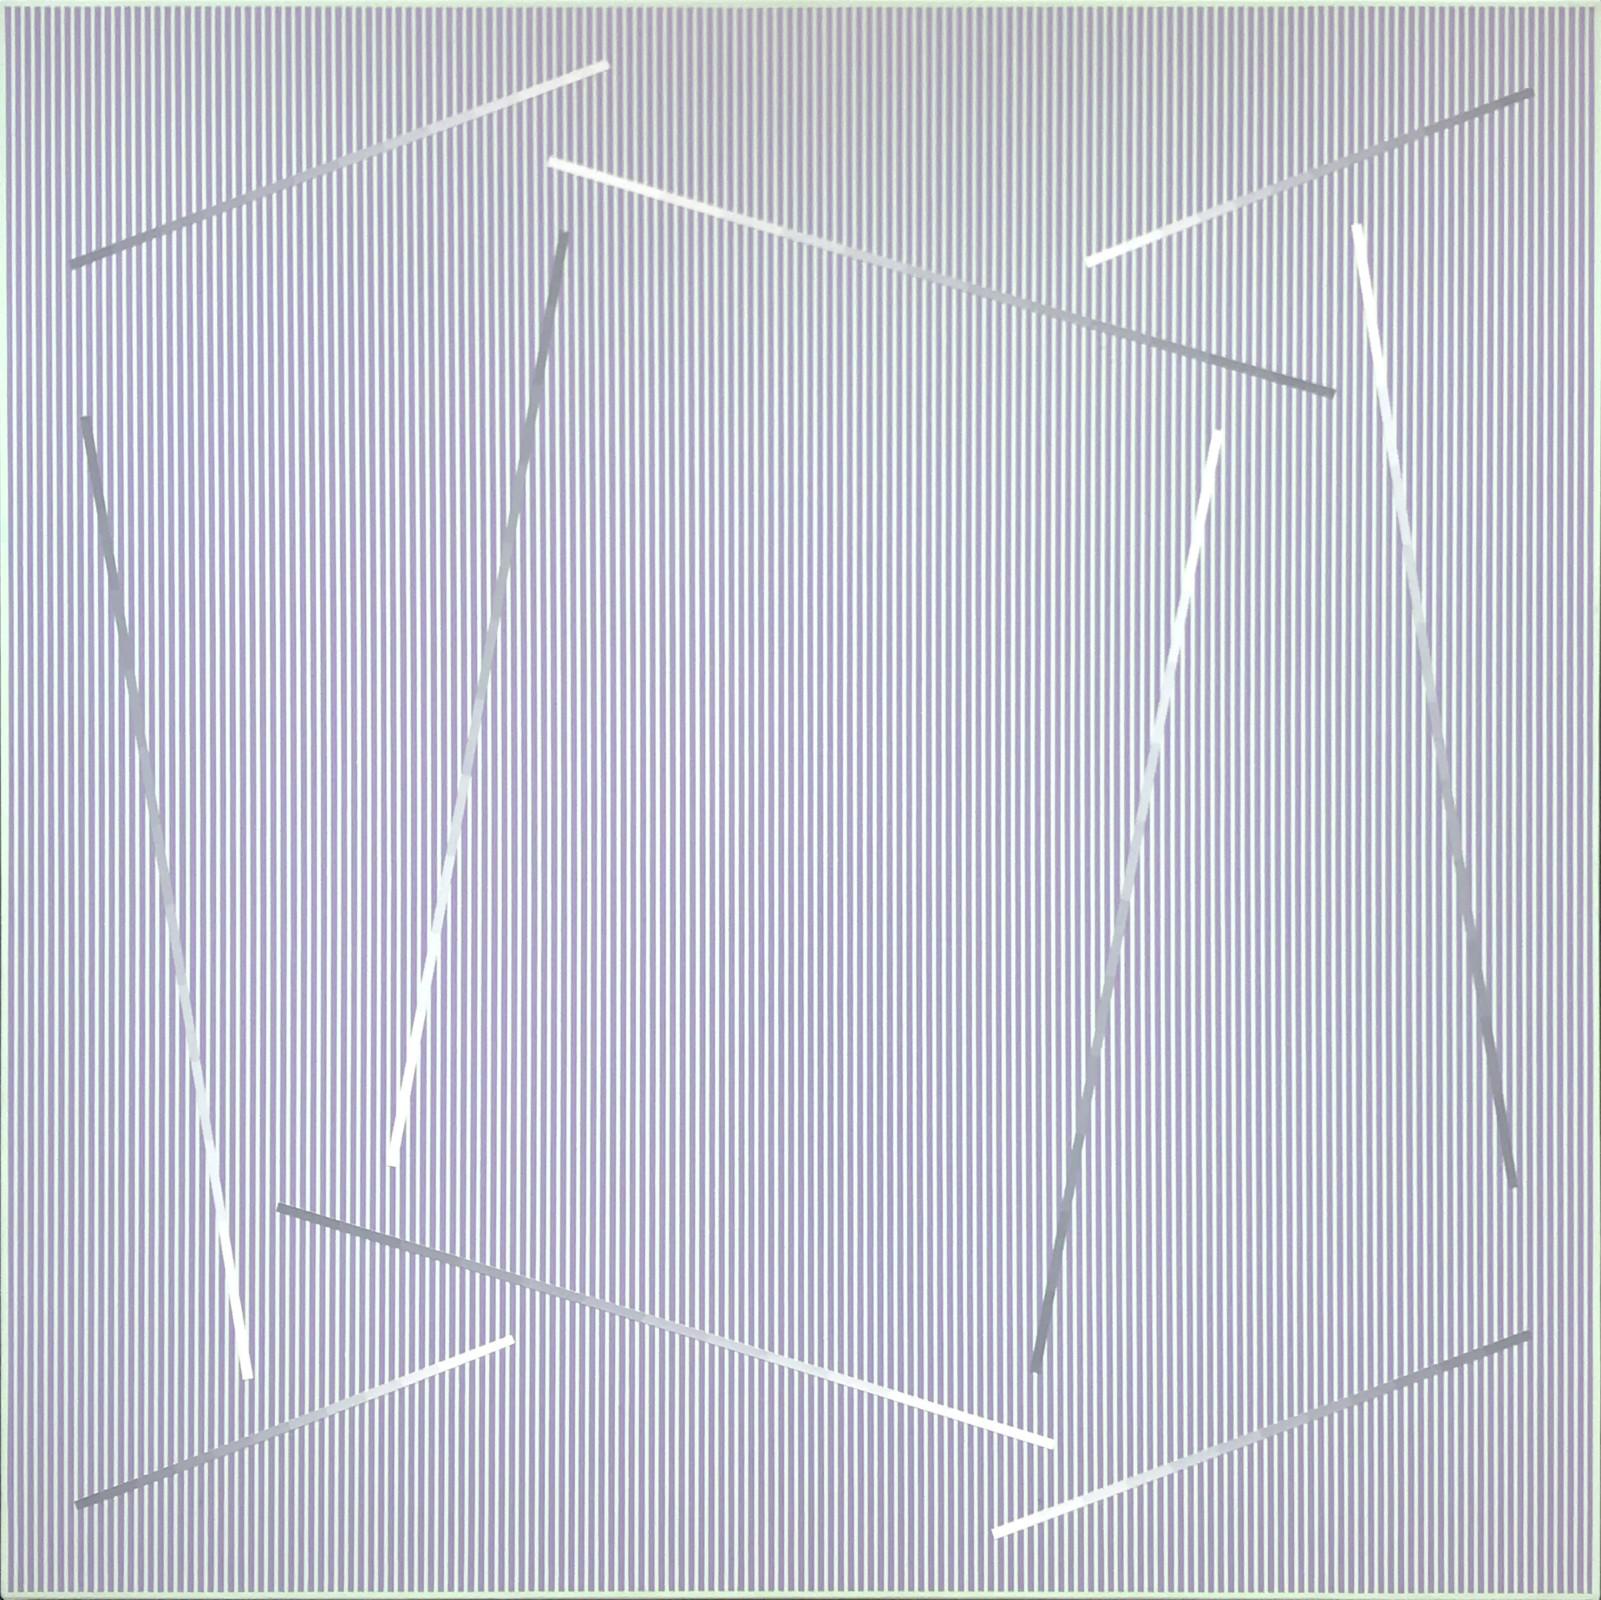 "<span class=""link fancybox-details-link""><a href=""/exhibitions/554/works/artworks_standalone10756/"">View Detail Page</a></span><div class=""artist""><span class=""artist""><strong>JULIAN STAŃCZAK</strong></span></div><div class=""title""><em>Within the Square</em>, 1989</div><div class=""medium"">Acrylic on canvas</div><div class=""dimensions"">127 x 127 cm<br />50 x 50 inches</div>"